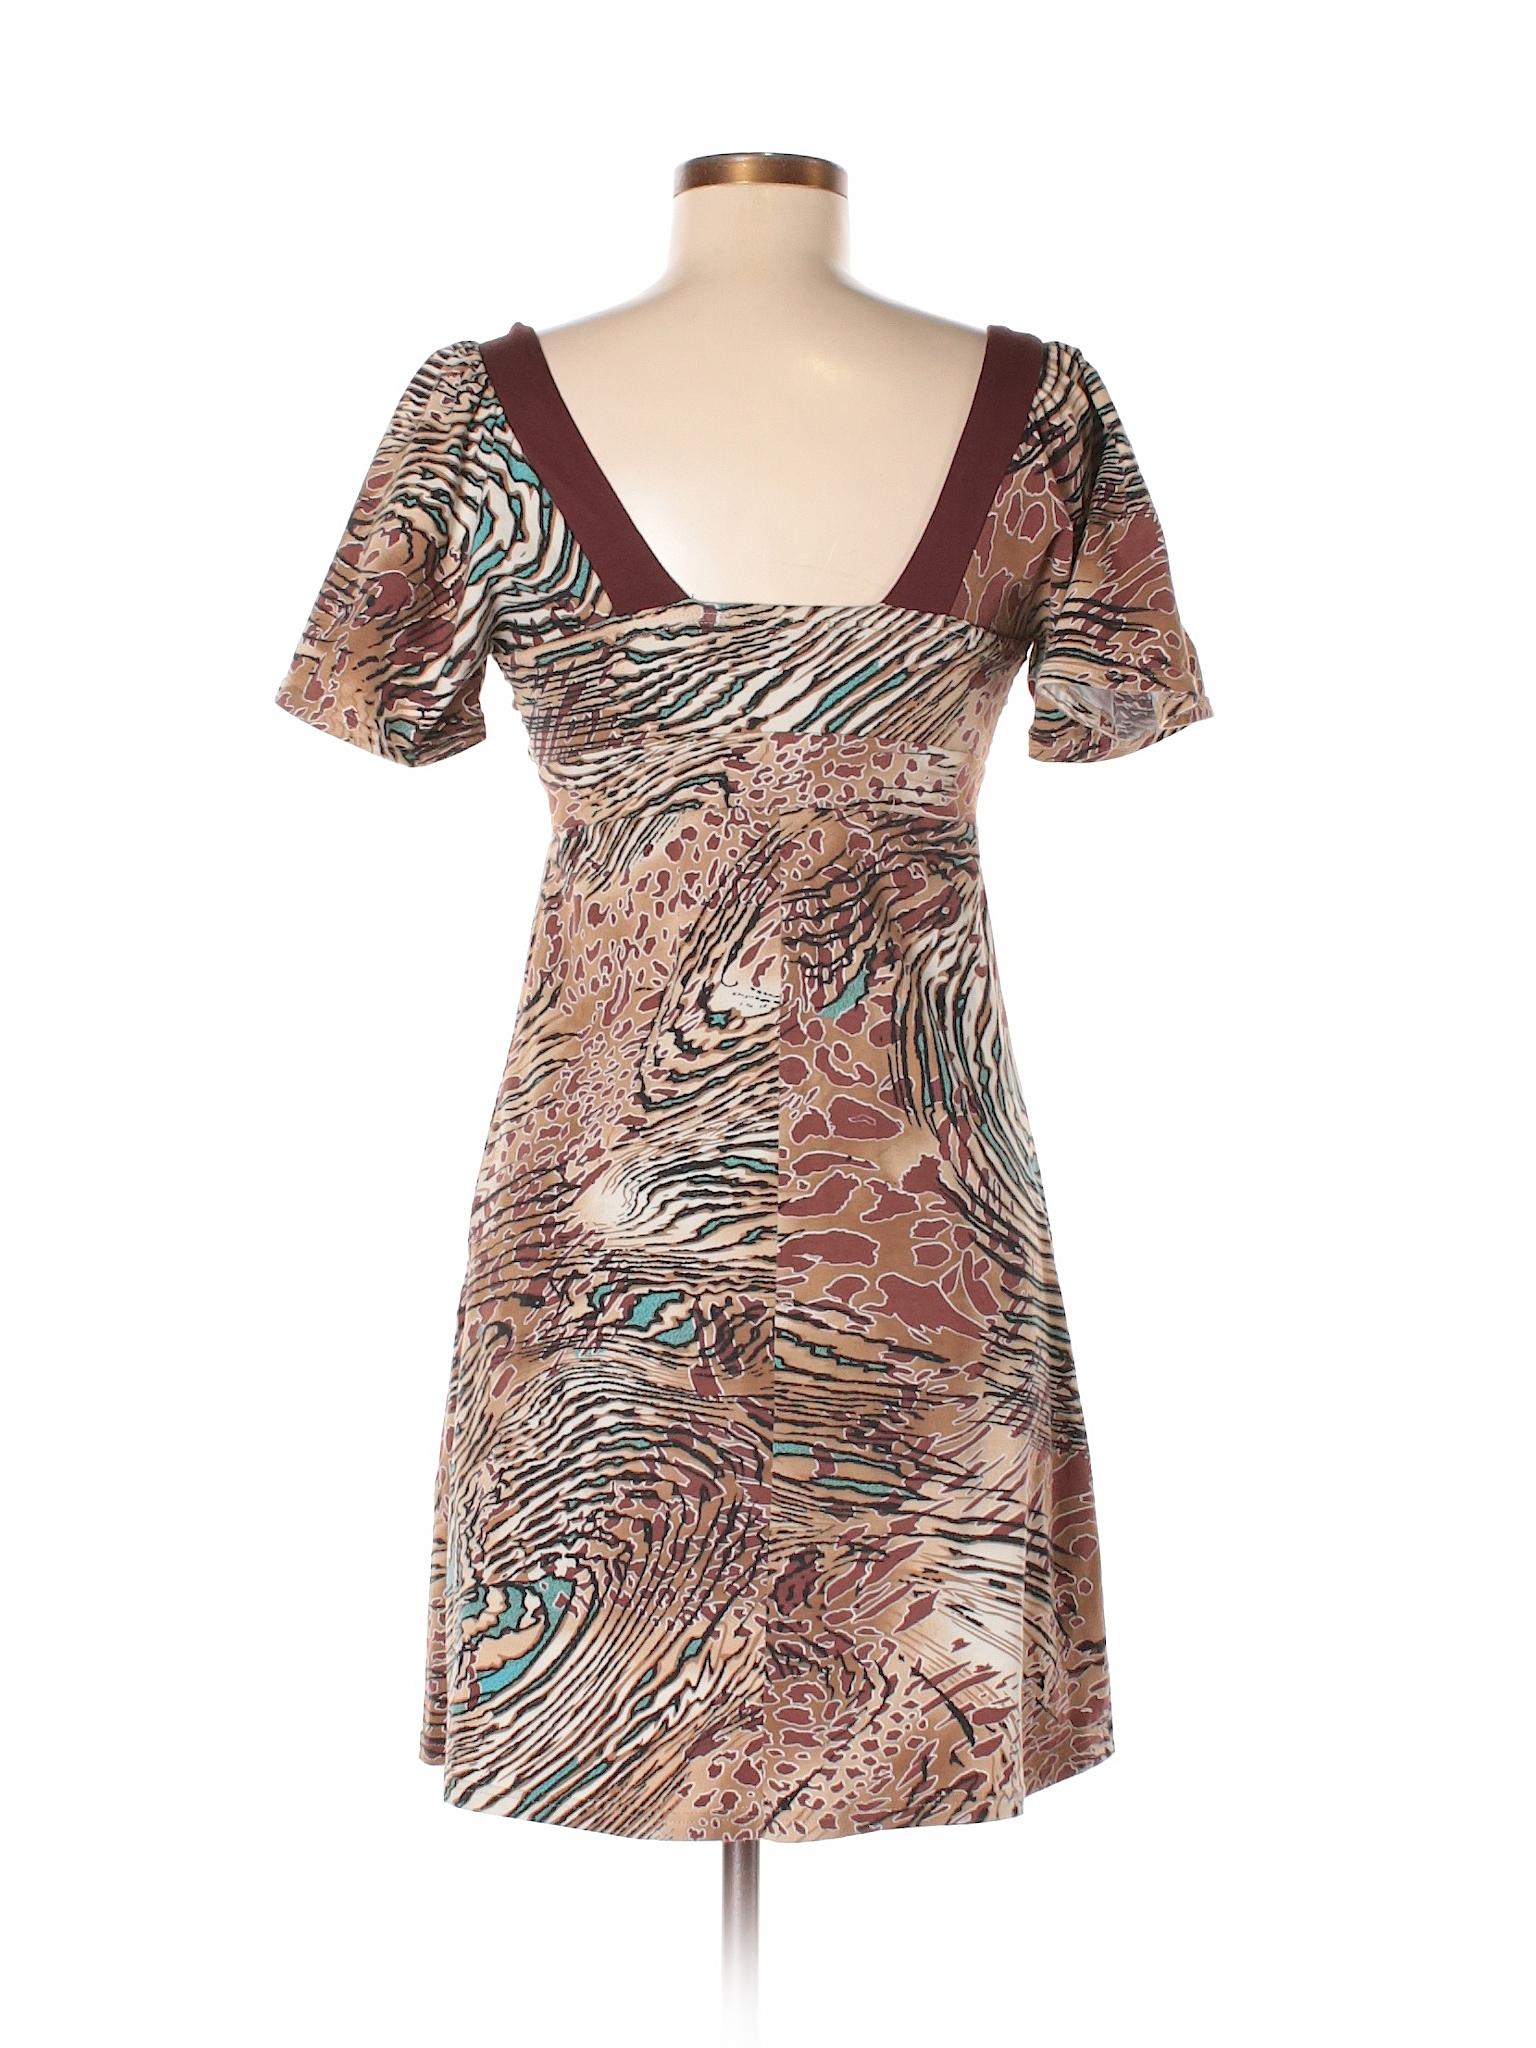 Free Casual winter Dress Joyous Boutique amp; fAanq